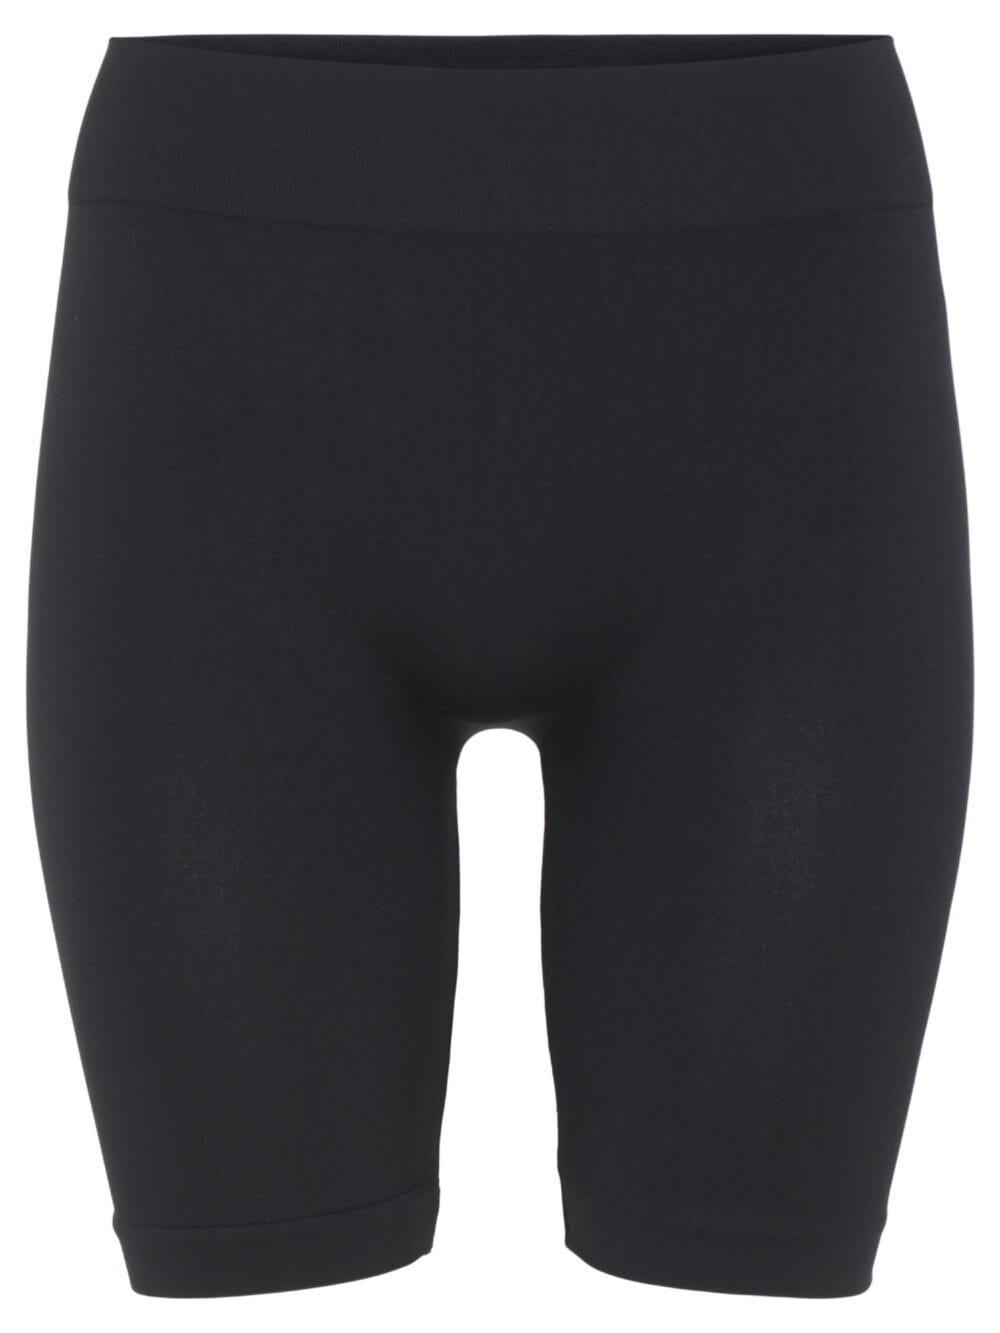 Decoy Seamless Shorts Black